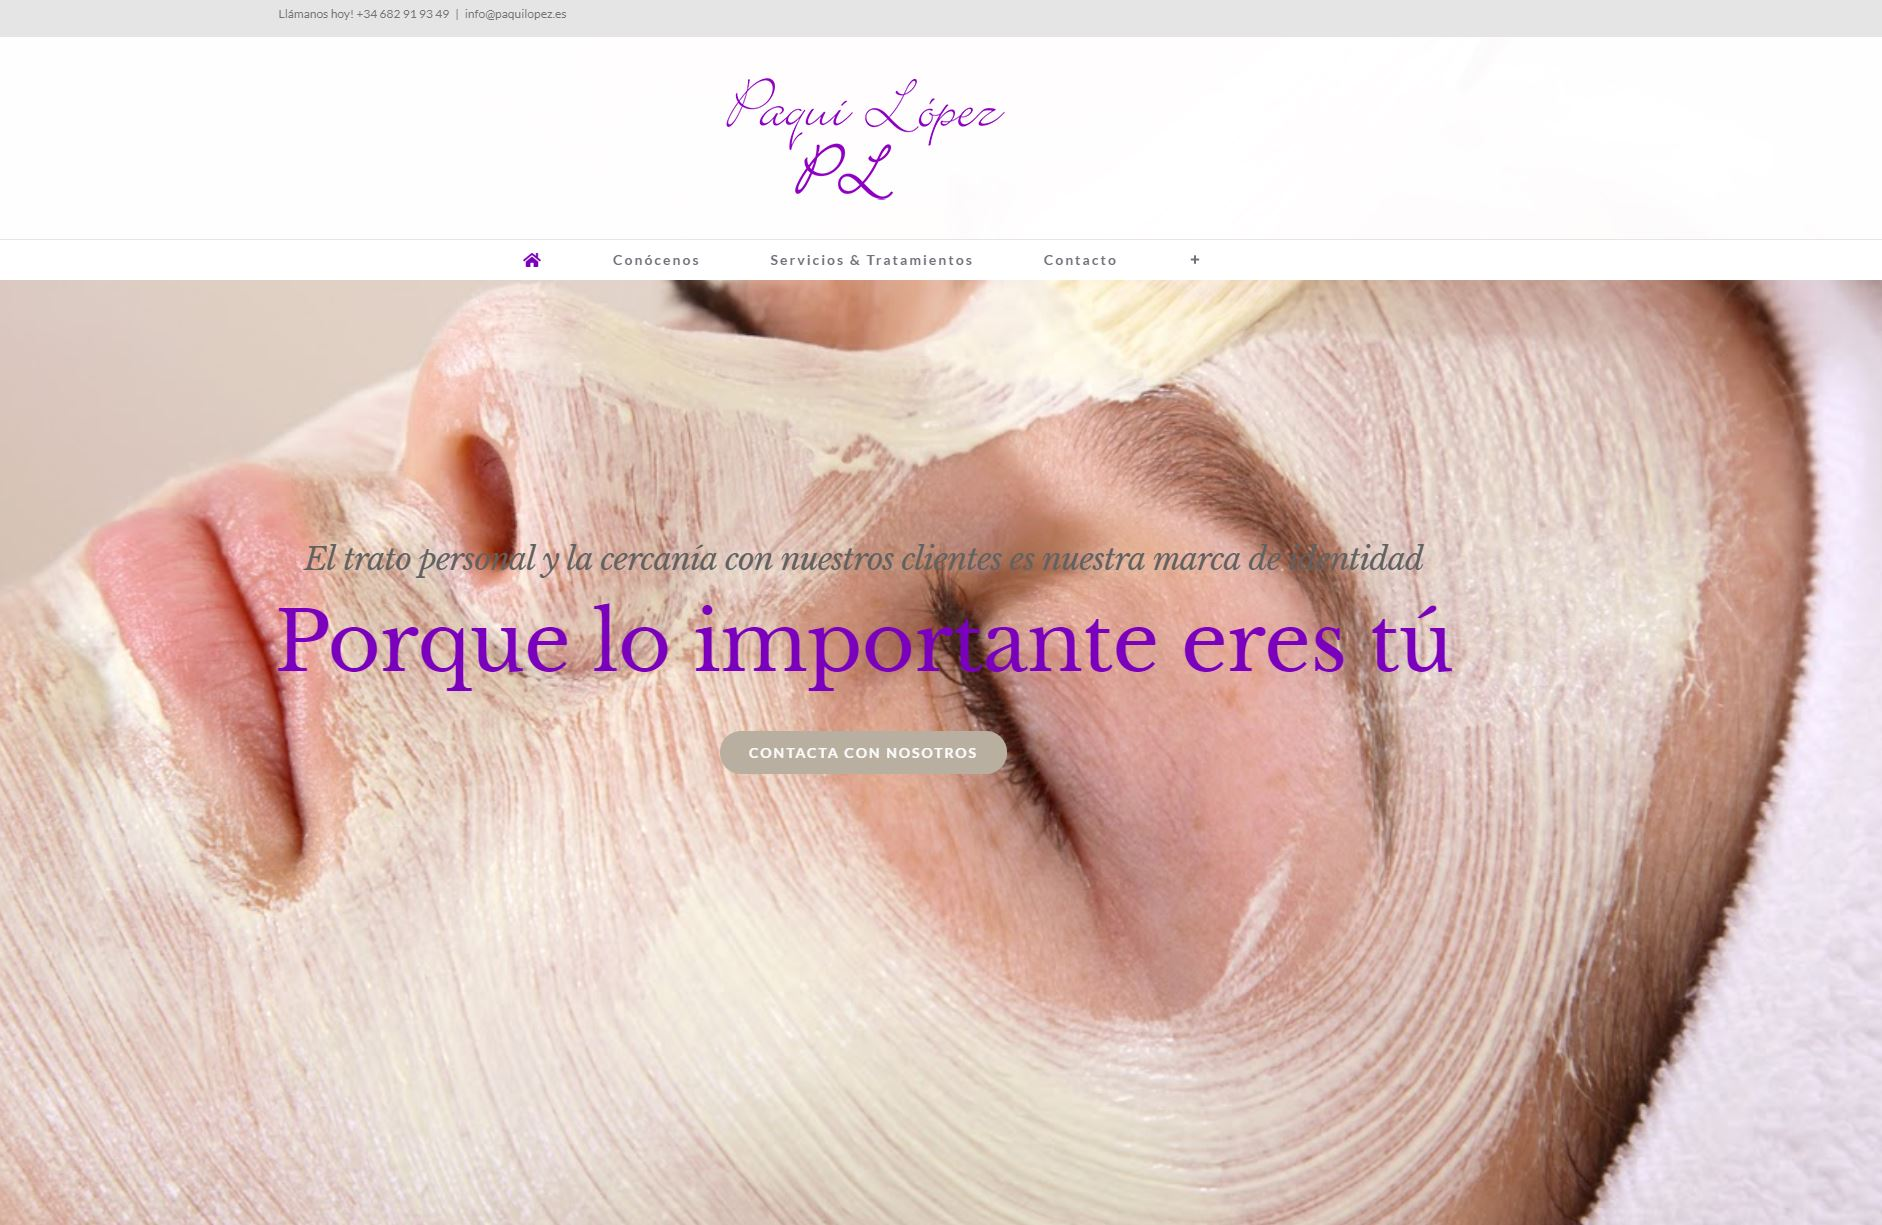 Centro de medicina estética Paqui López